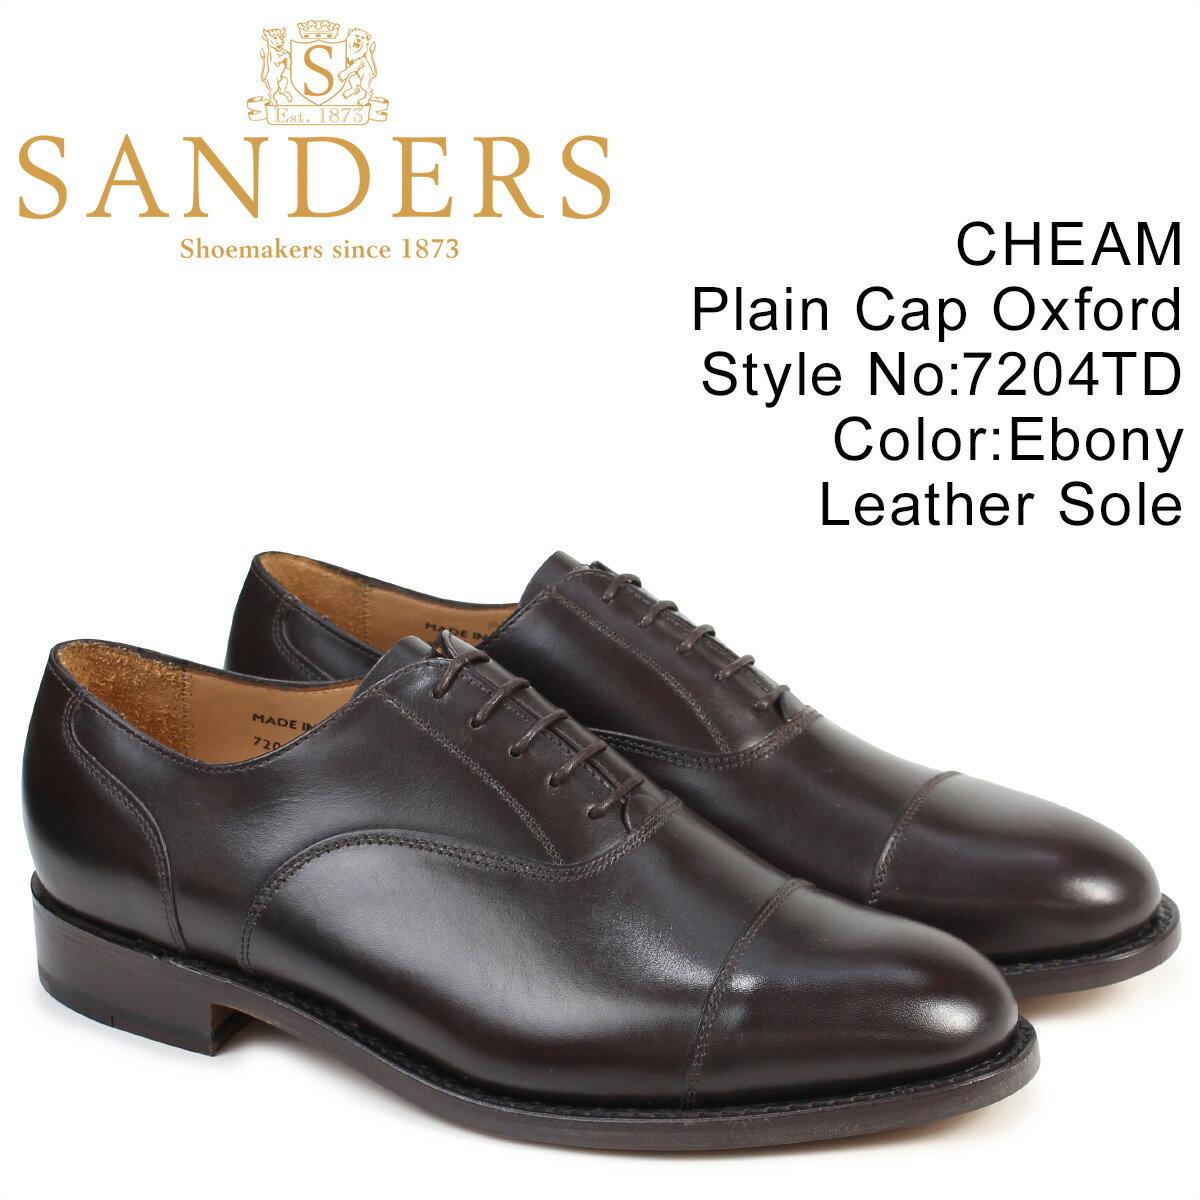 SANDERS 靴 サンダース ミリタリー オックスフォード シューズ ビジネス CHEAM 7204TD メンズ ダークブラウン [176]